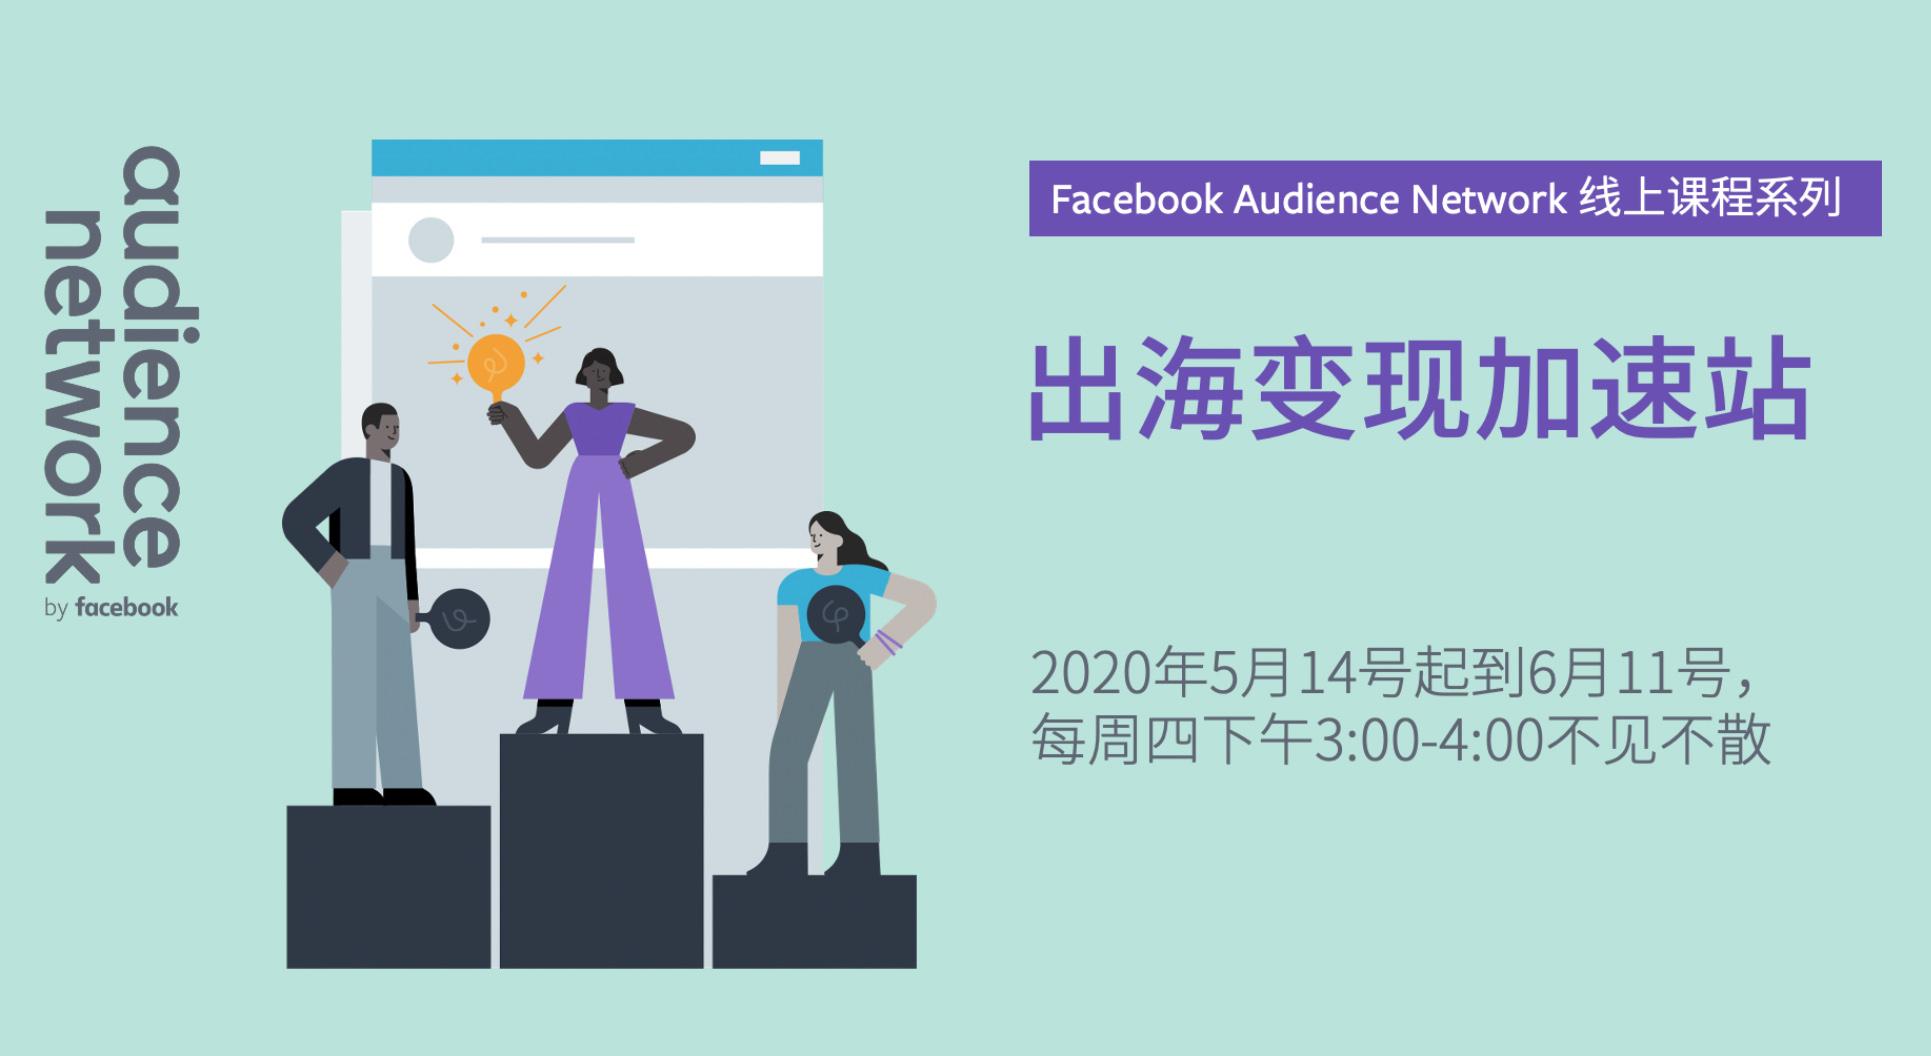 Facebook Audience Network 线上课程系列:出海变现加速站 - 移动互联网出海,出海服务,海外的行业服务平台 - Enjoy出海